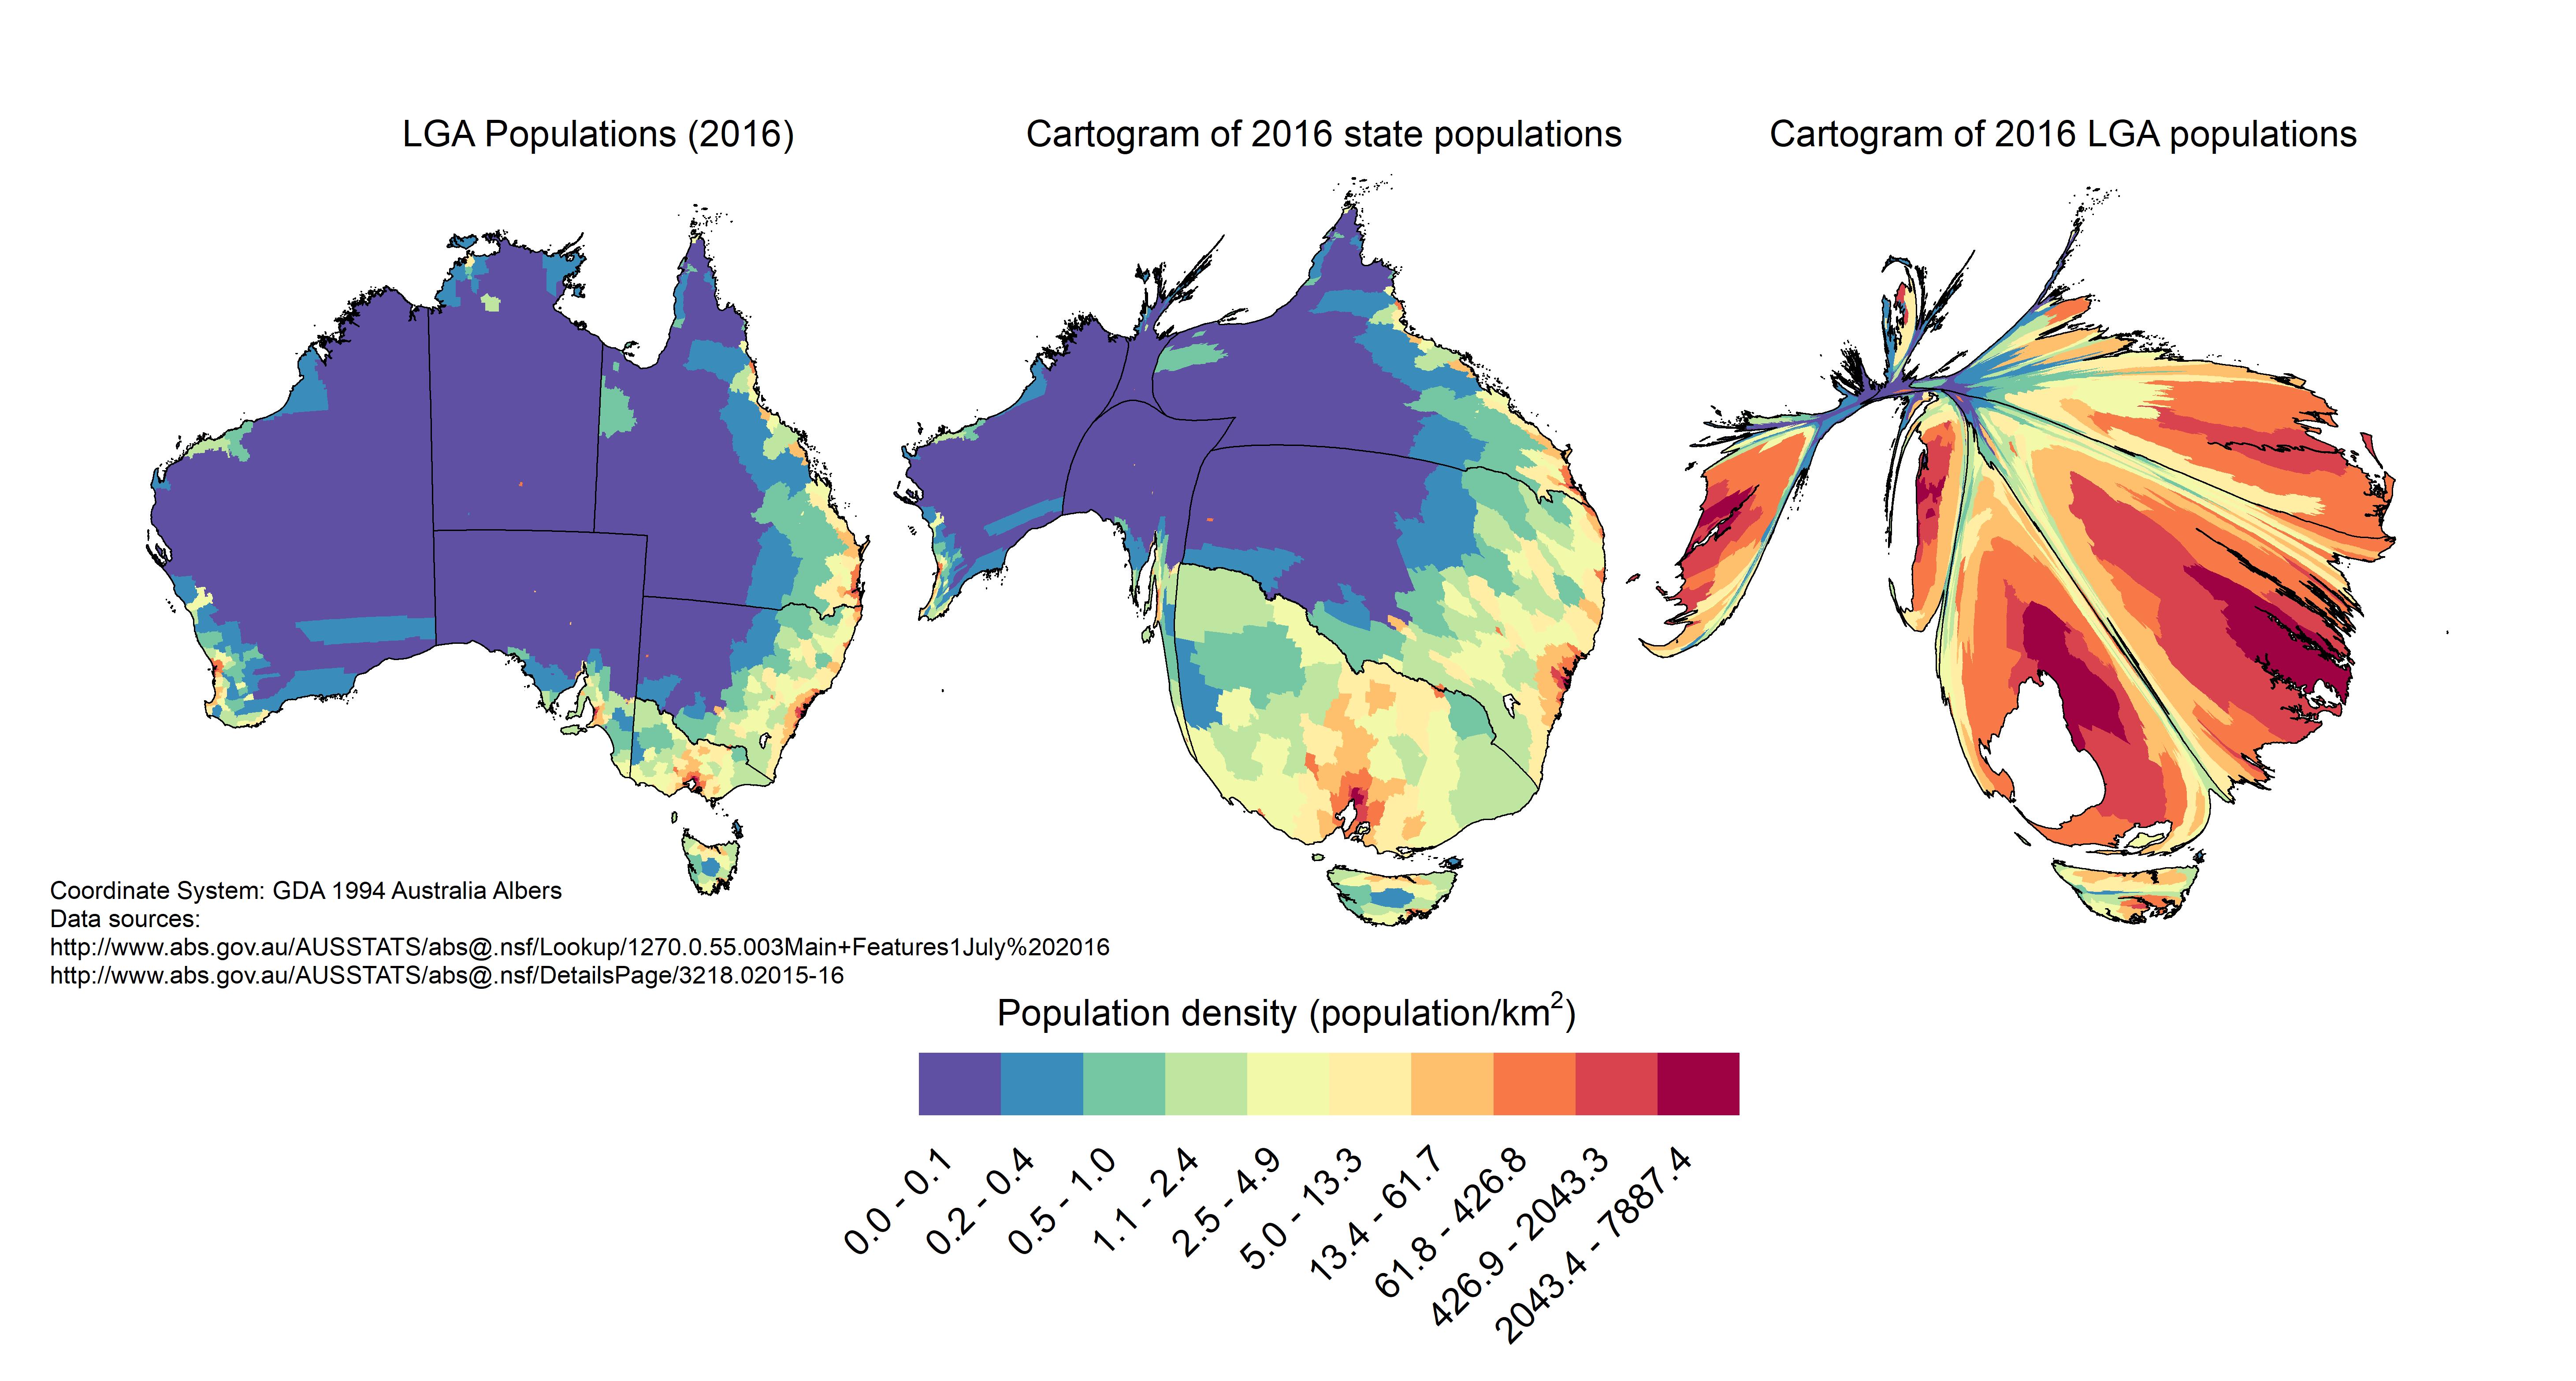 Australian potion cartogram | Australia | Australia map, Map ... on choropleth map of the world, cartogram of population density of pennsylvania, map map of the world, cartogram map europe, chart map of the world, scale map of the world, cartogram map of the caribbean, geography map of the world, cartogram map mexico, global map of the world, gis map of the world,